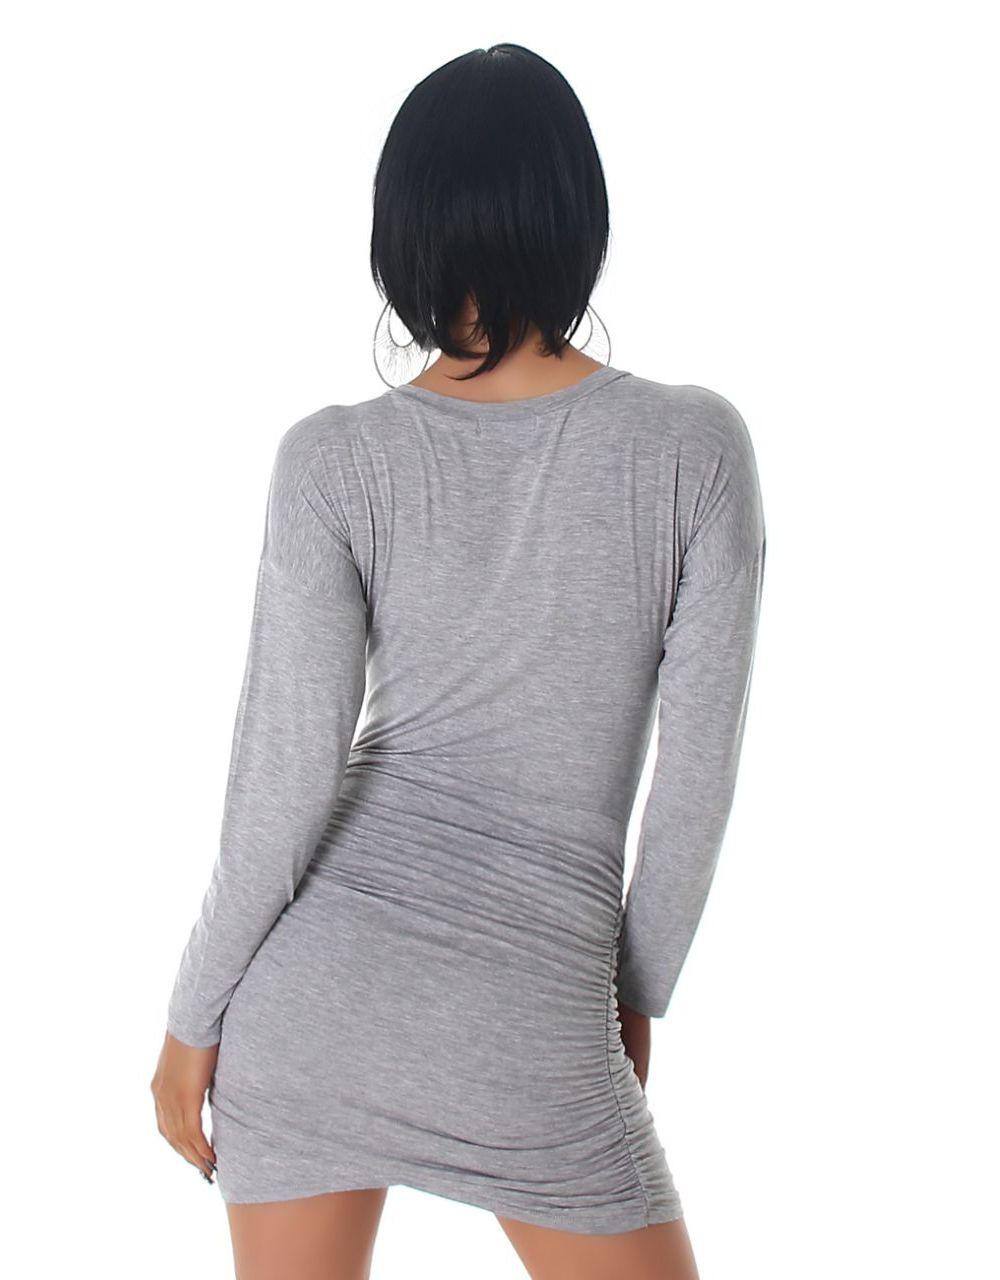 Langarm Longtop Minikleid Mit Wickeleffekt  Ebay